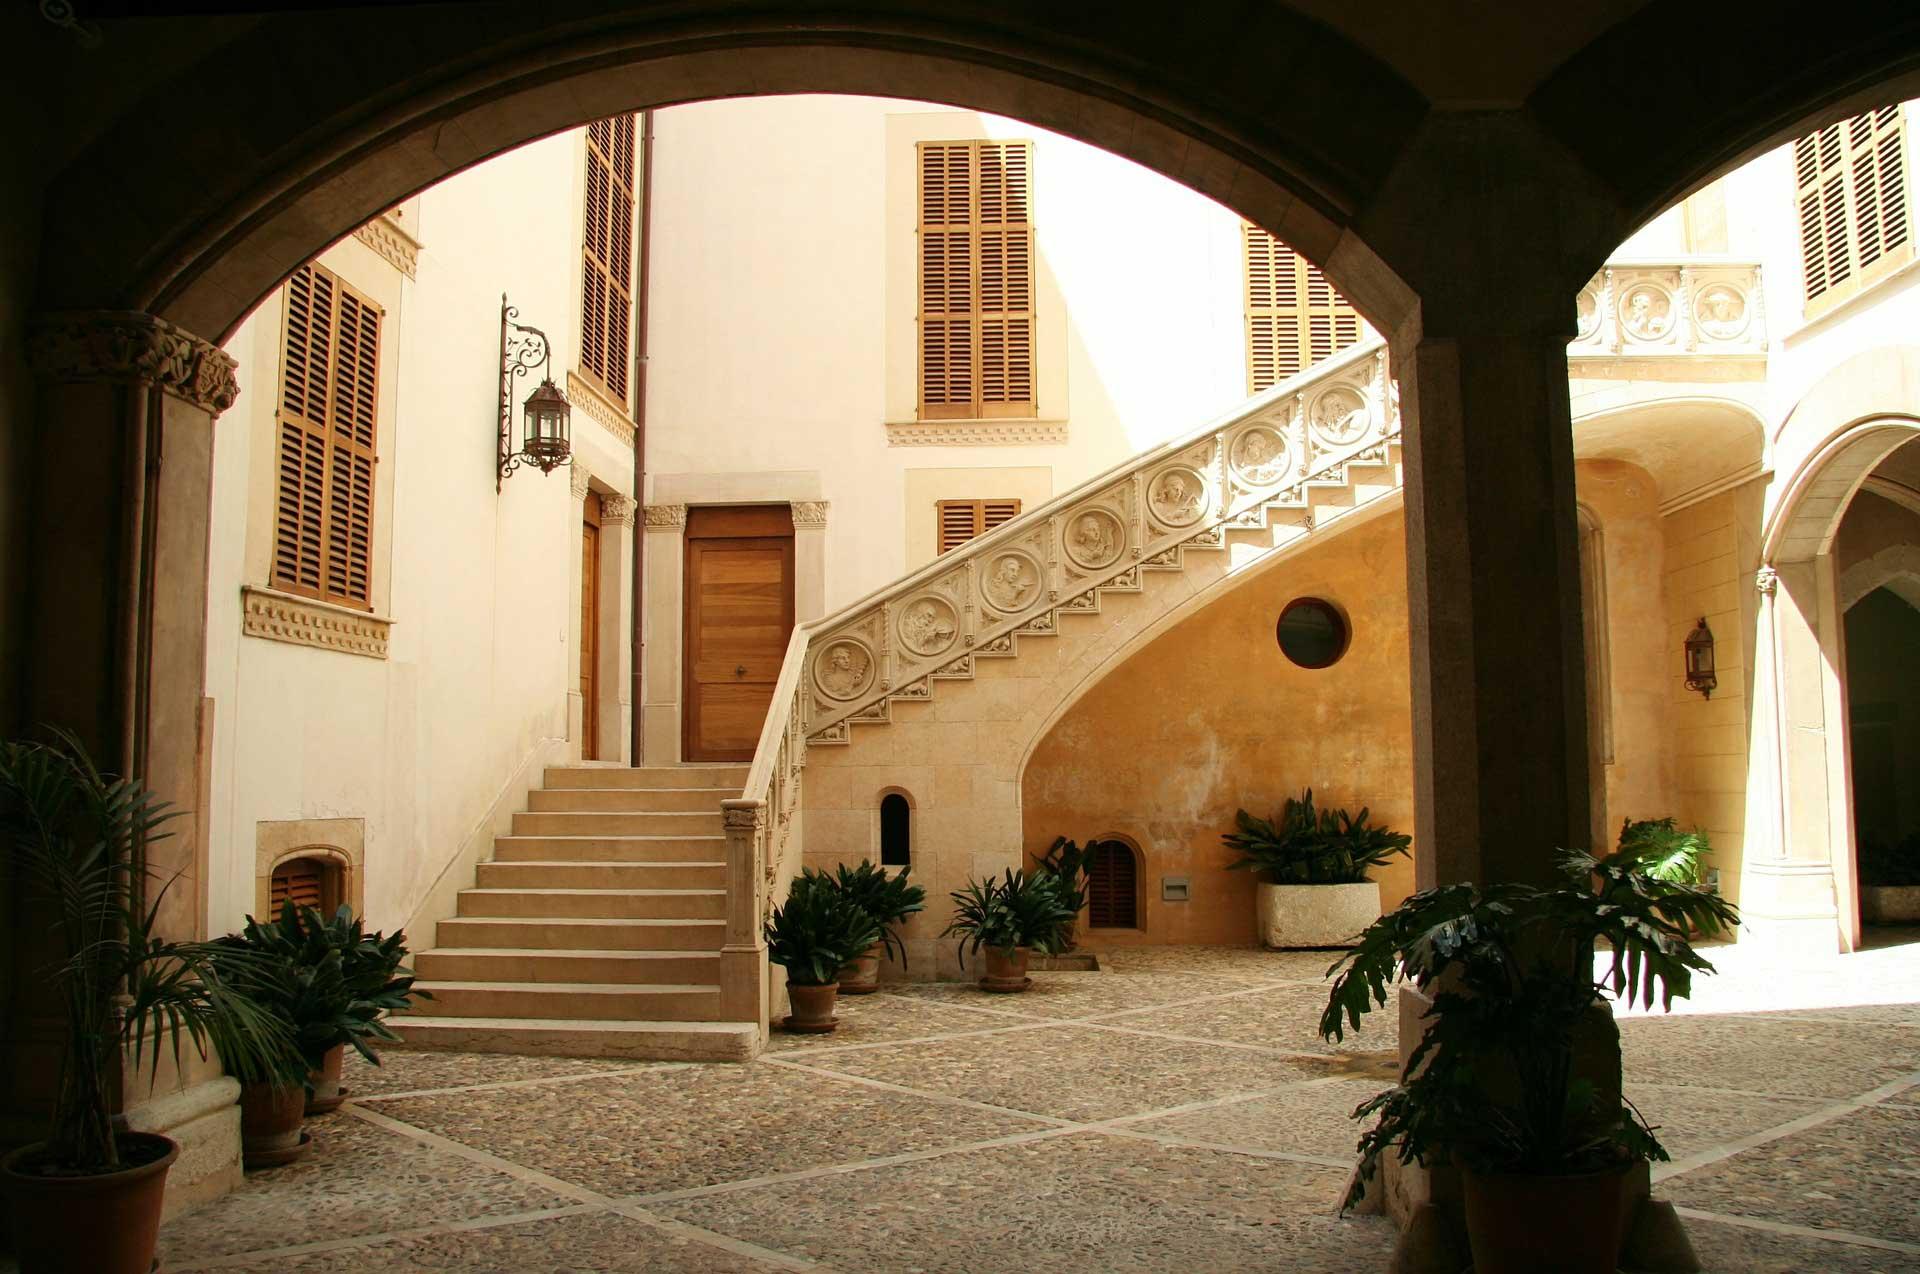 Spanish Courtyard - Lytchee